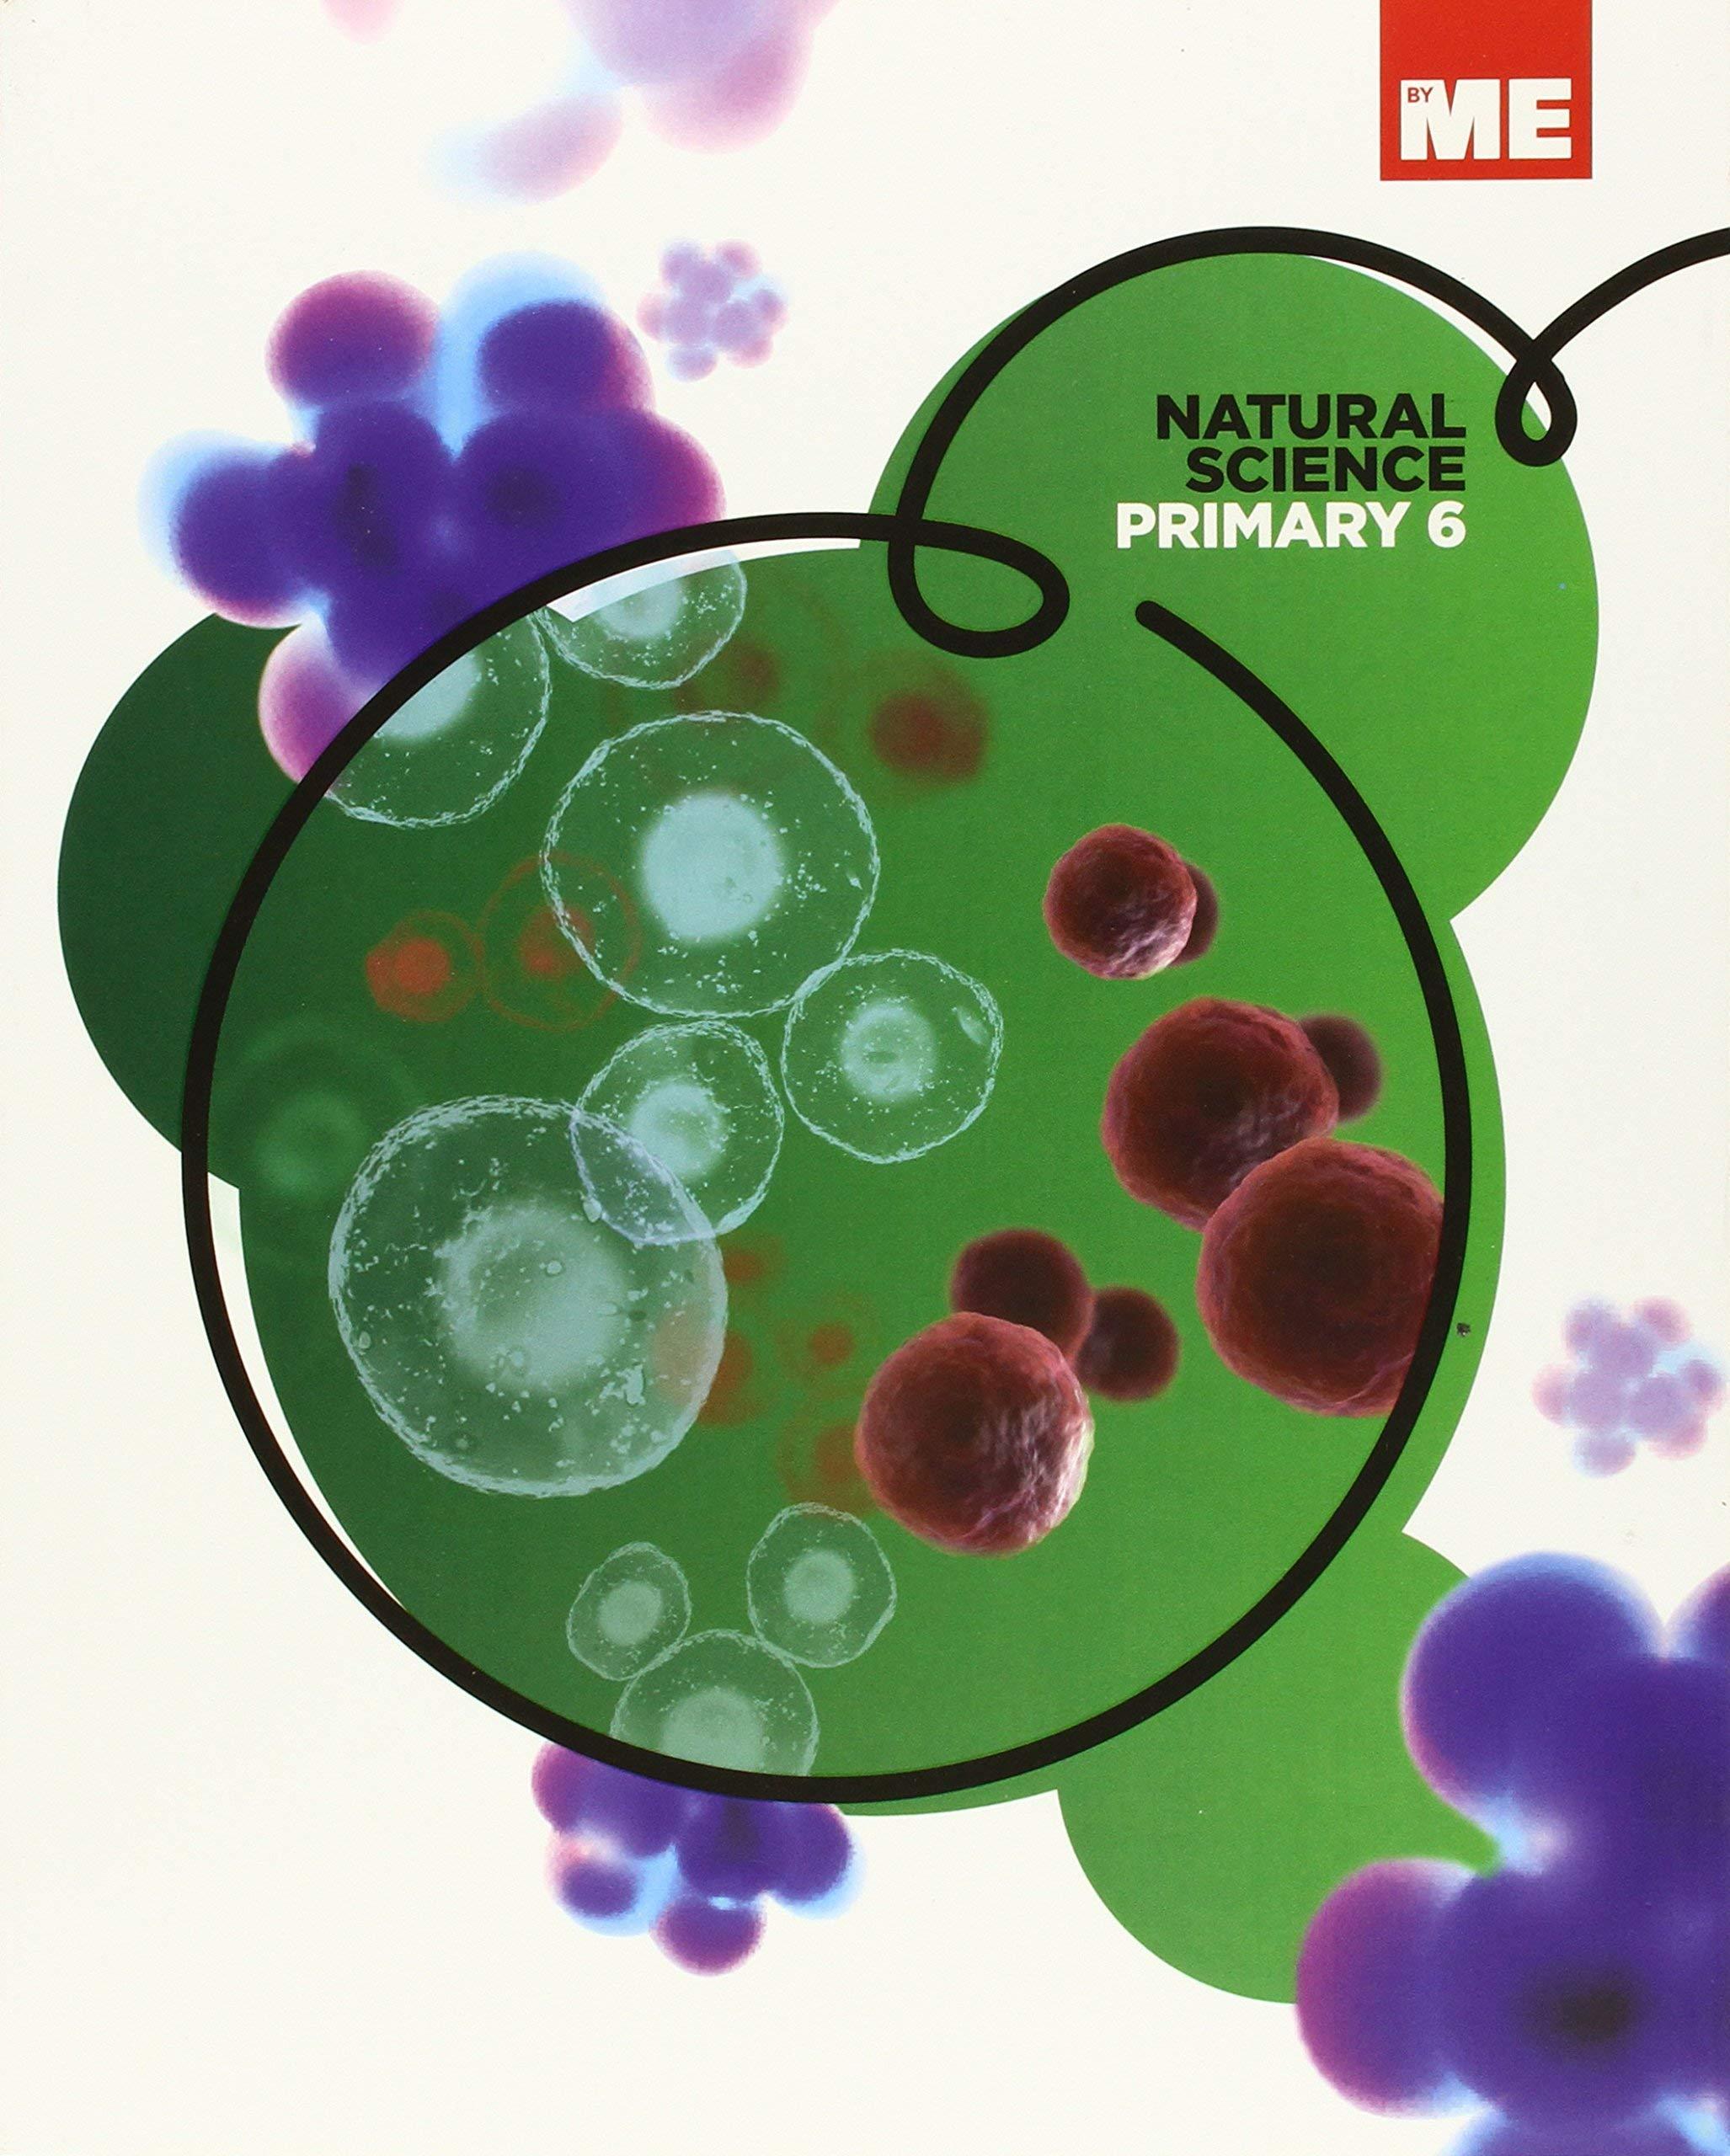 Natural Science 6 Pack (CC. Naturales Nivel 6): Amazon.es: Metters, Debbie, Cockburn, Beatrice Mercedes: Libros en idiomas extranjeros